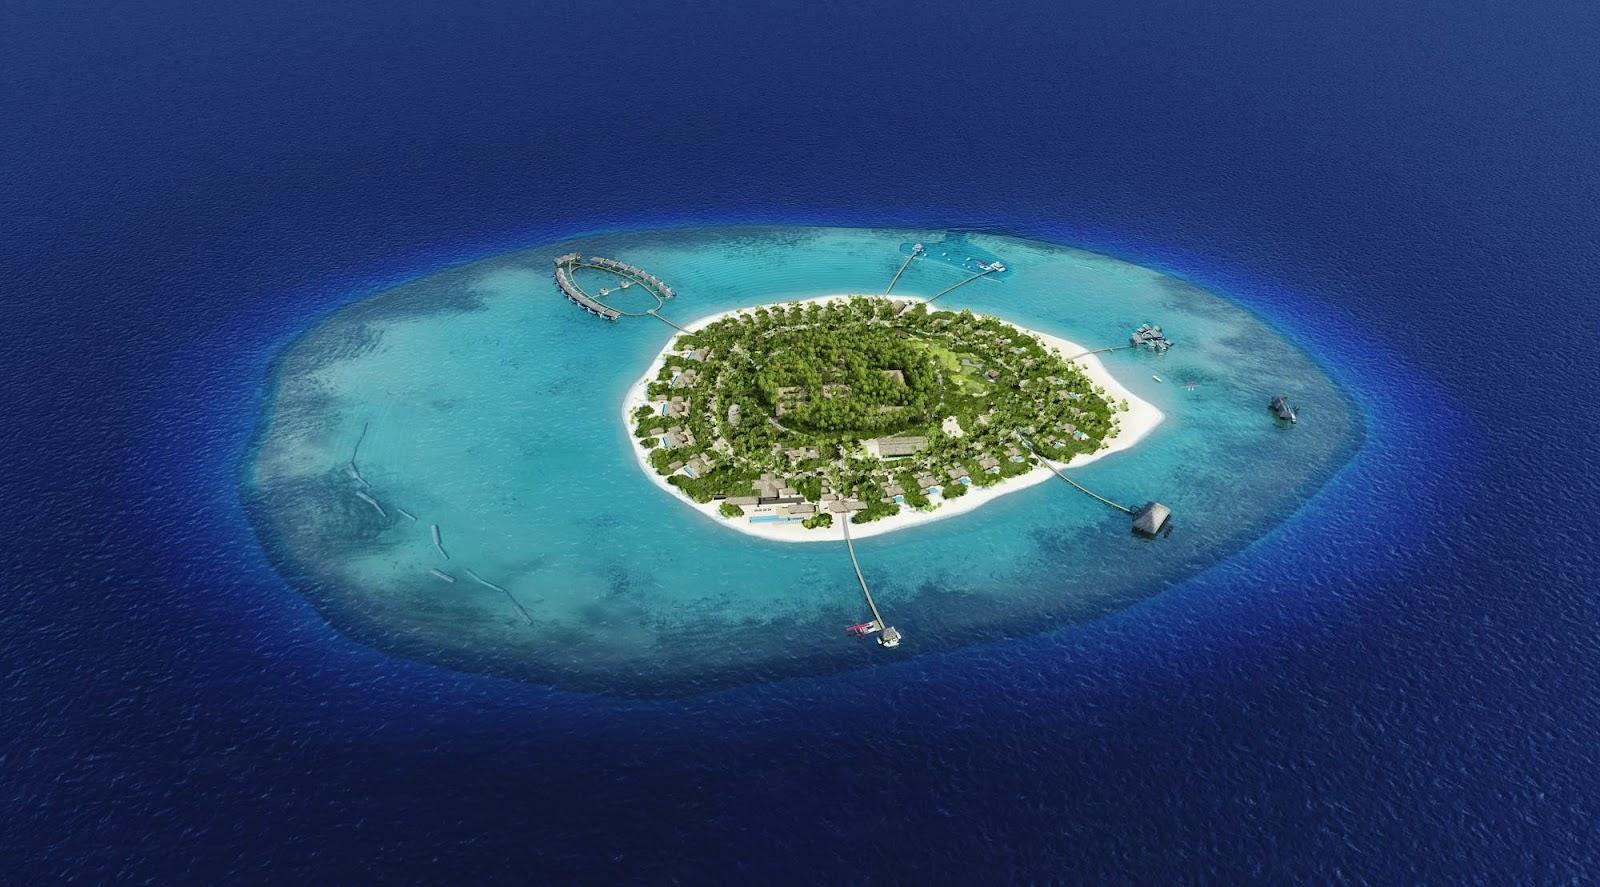 Cool-Island-View-Wallpaper-Image.jpg